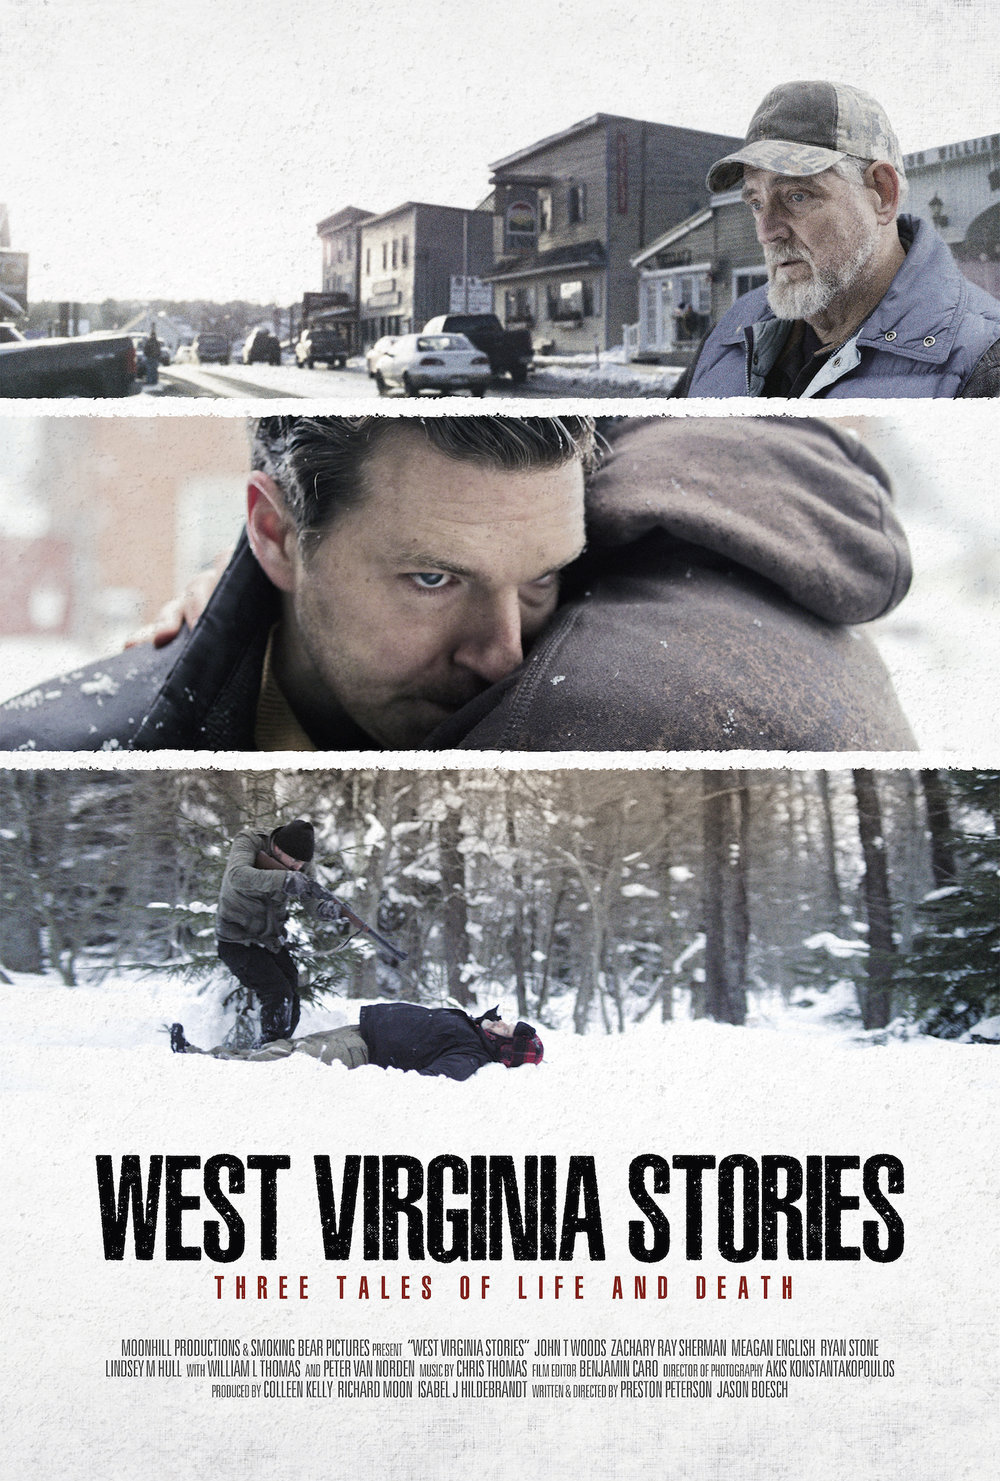 West_Virgina_Stories-Poster.jpg